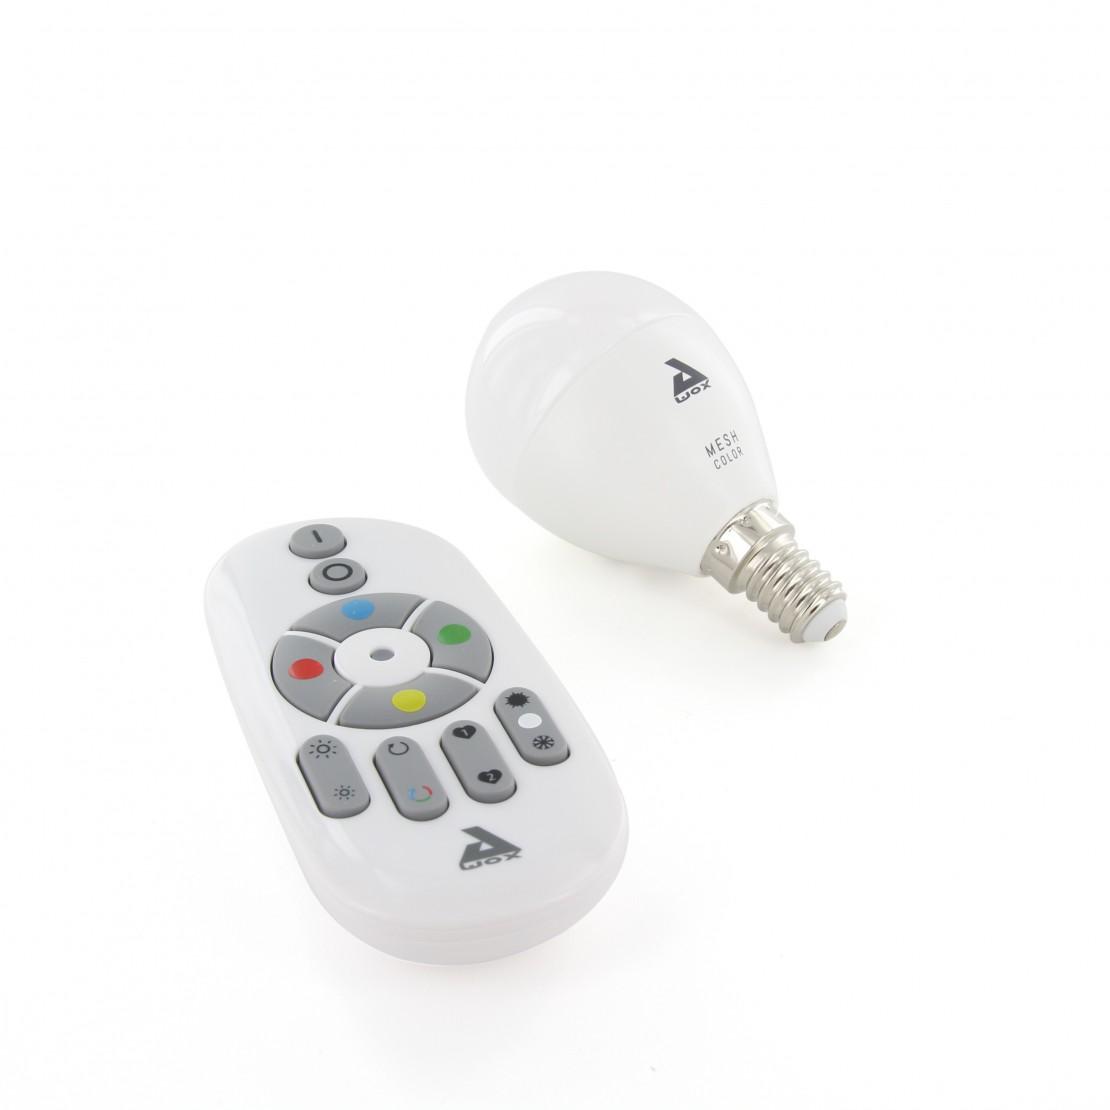 Kit de bombilla E14 color Bluetooth Mesh y mando a distancia